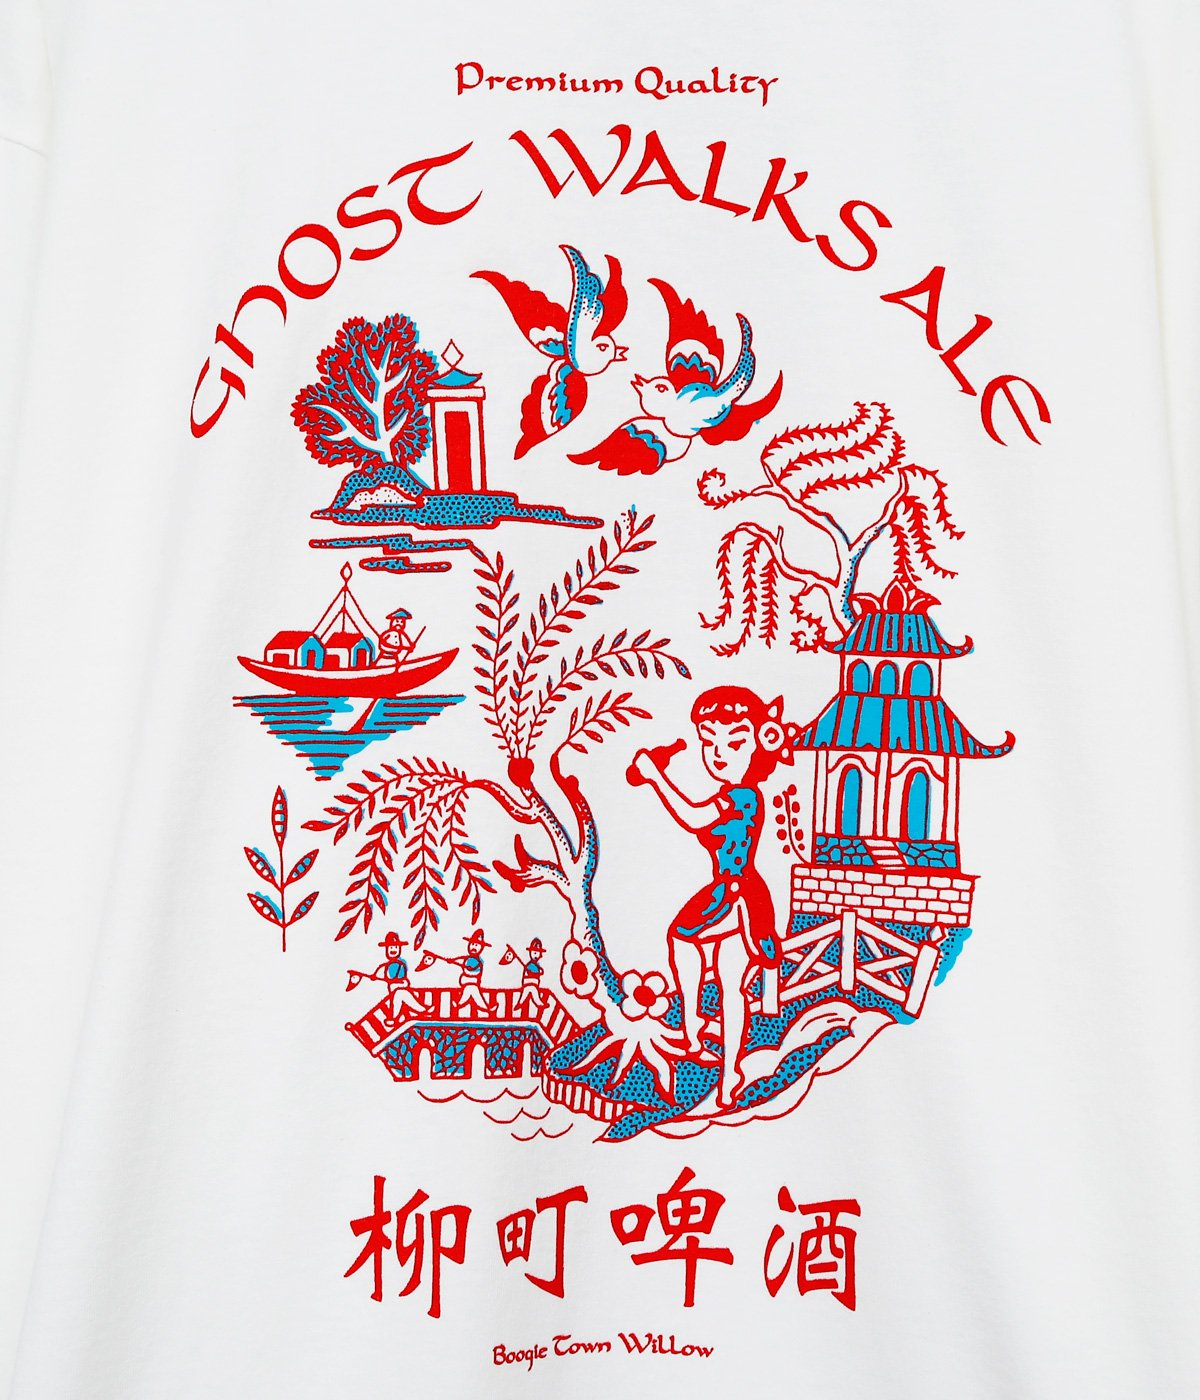 GHOST WALKS ALE LS shirt